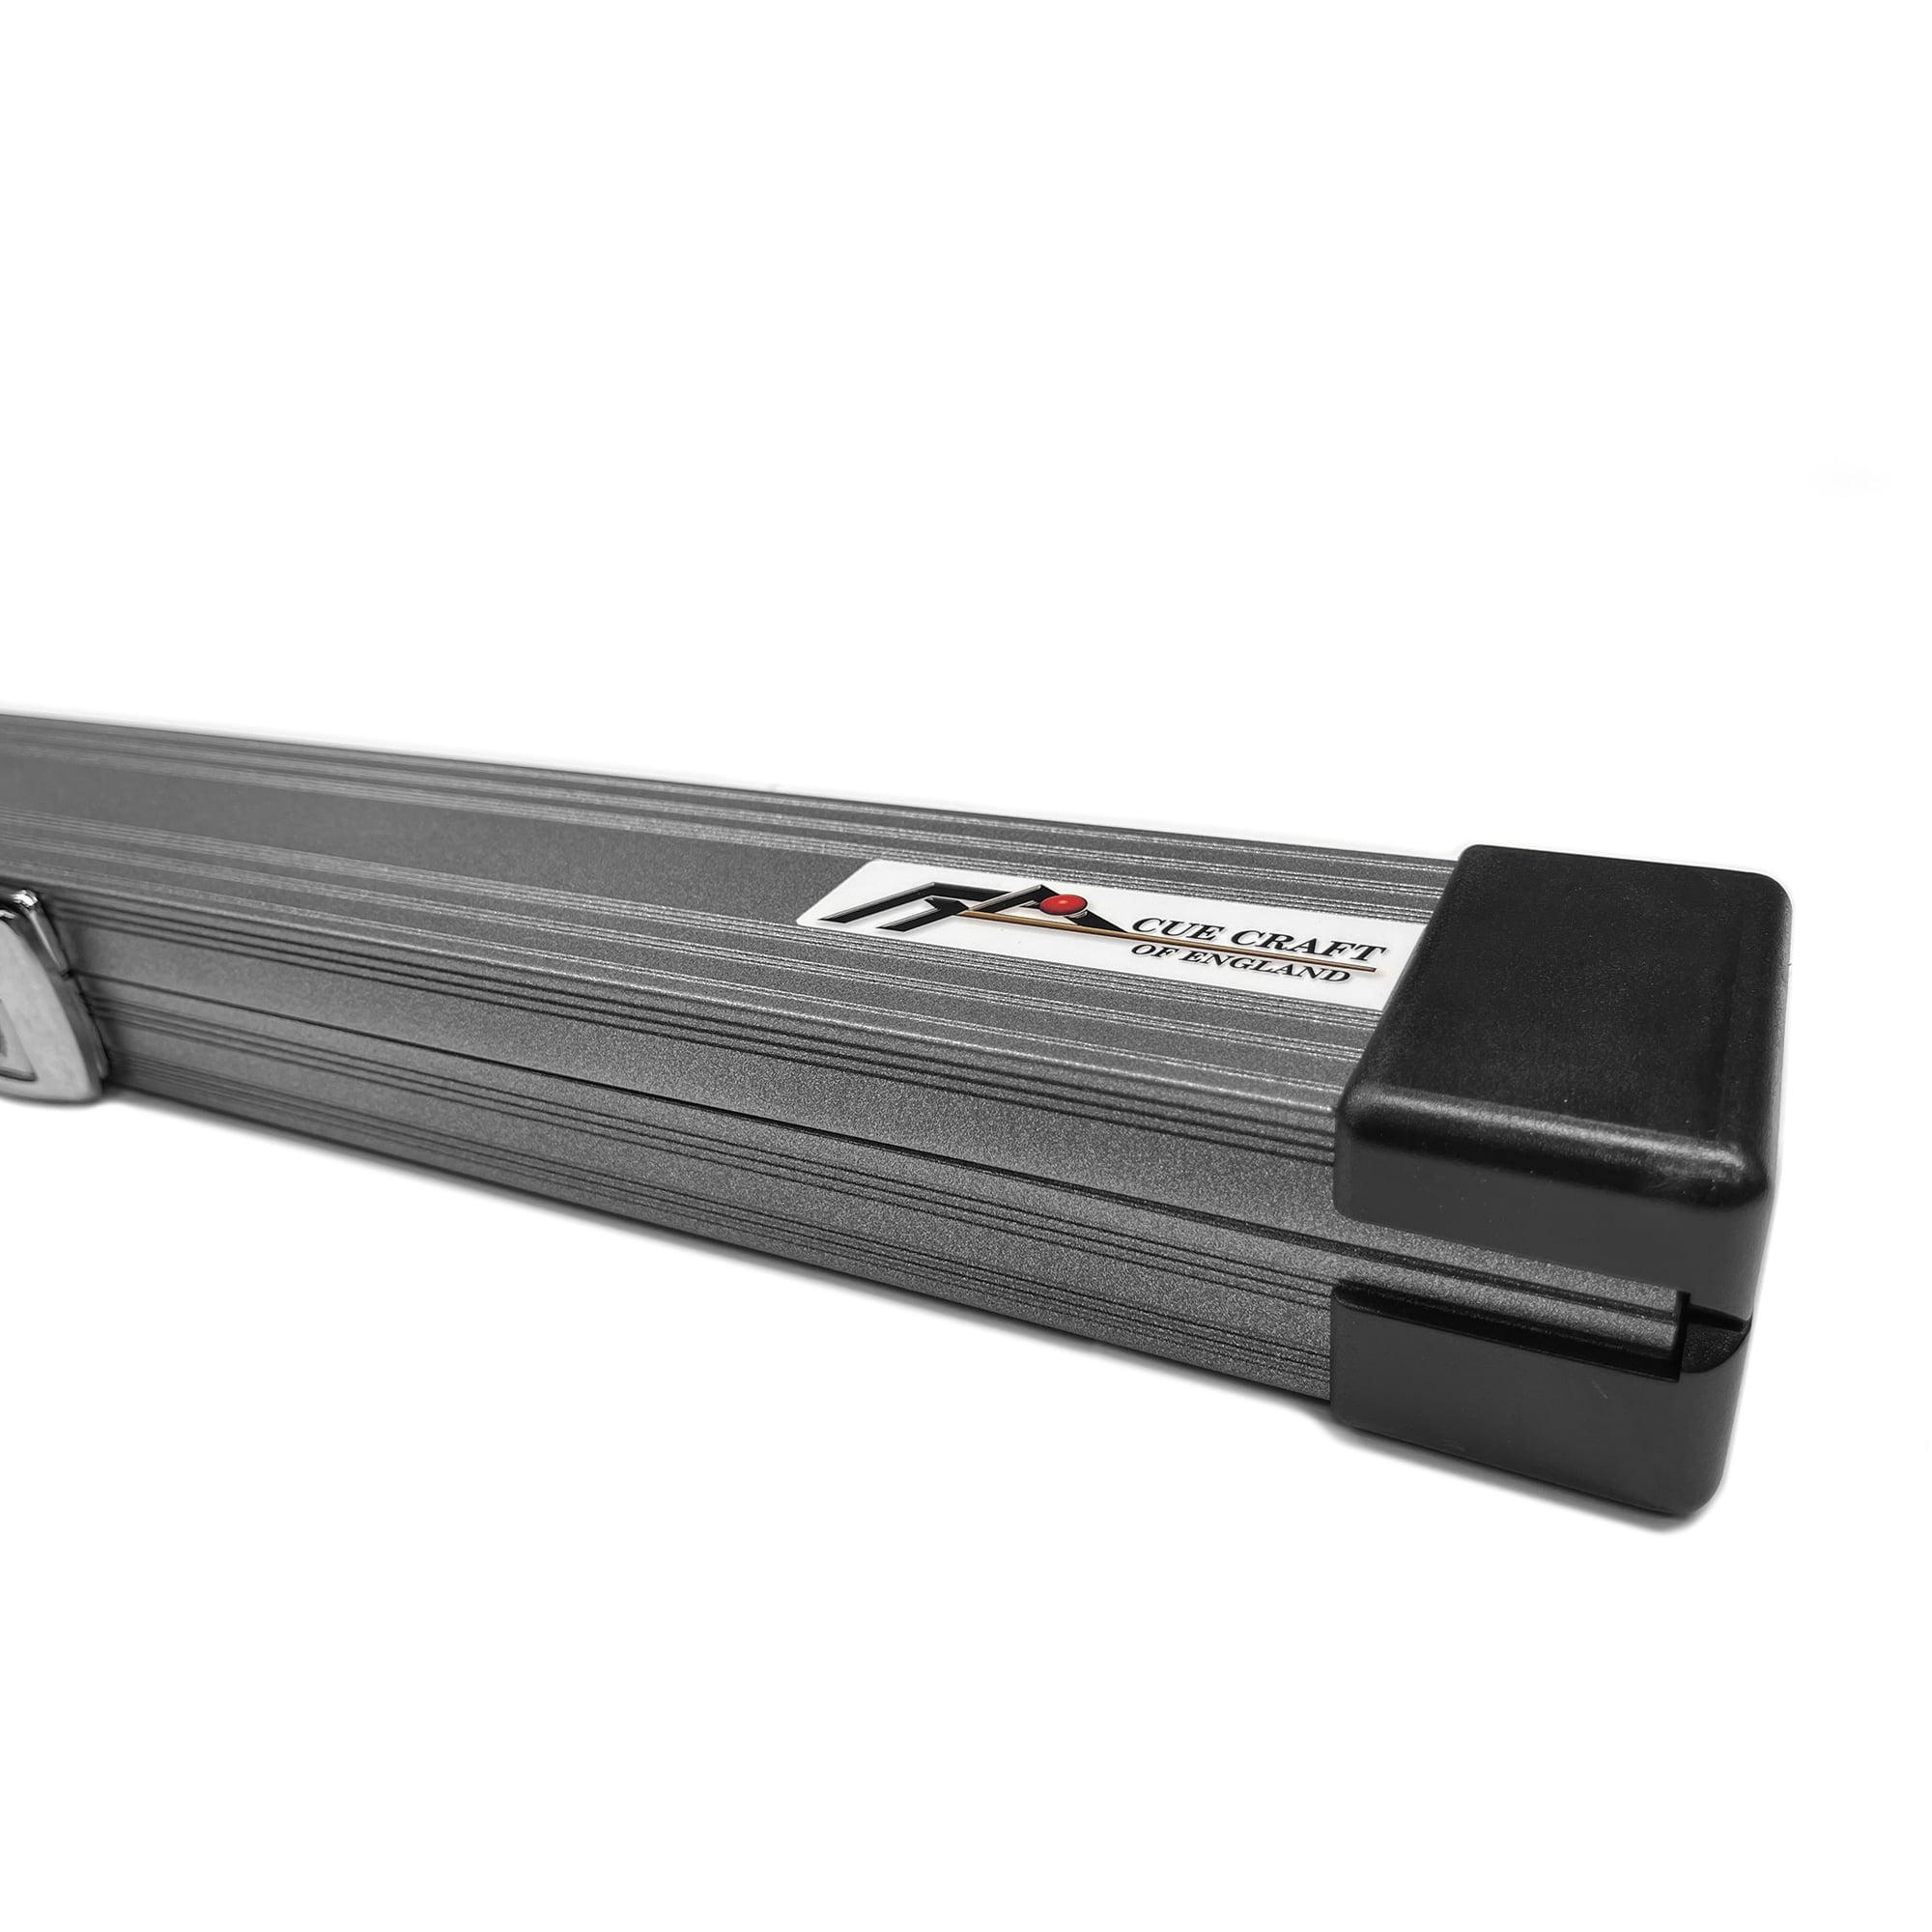 Cue Craft Gloss Silver 1 Piece Aluminium Snooker Cue Case